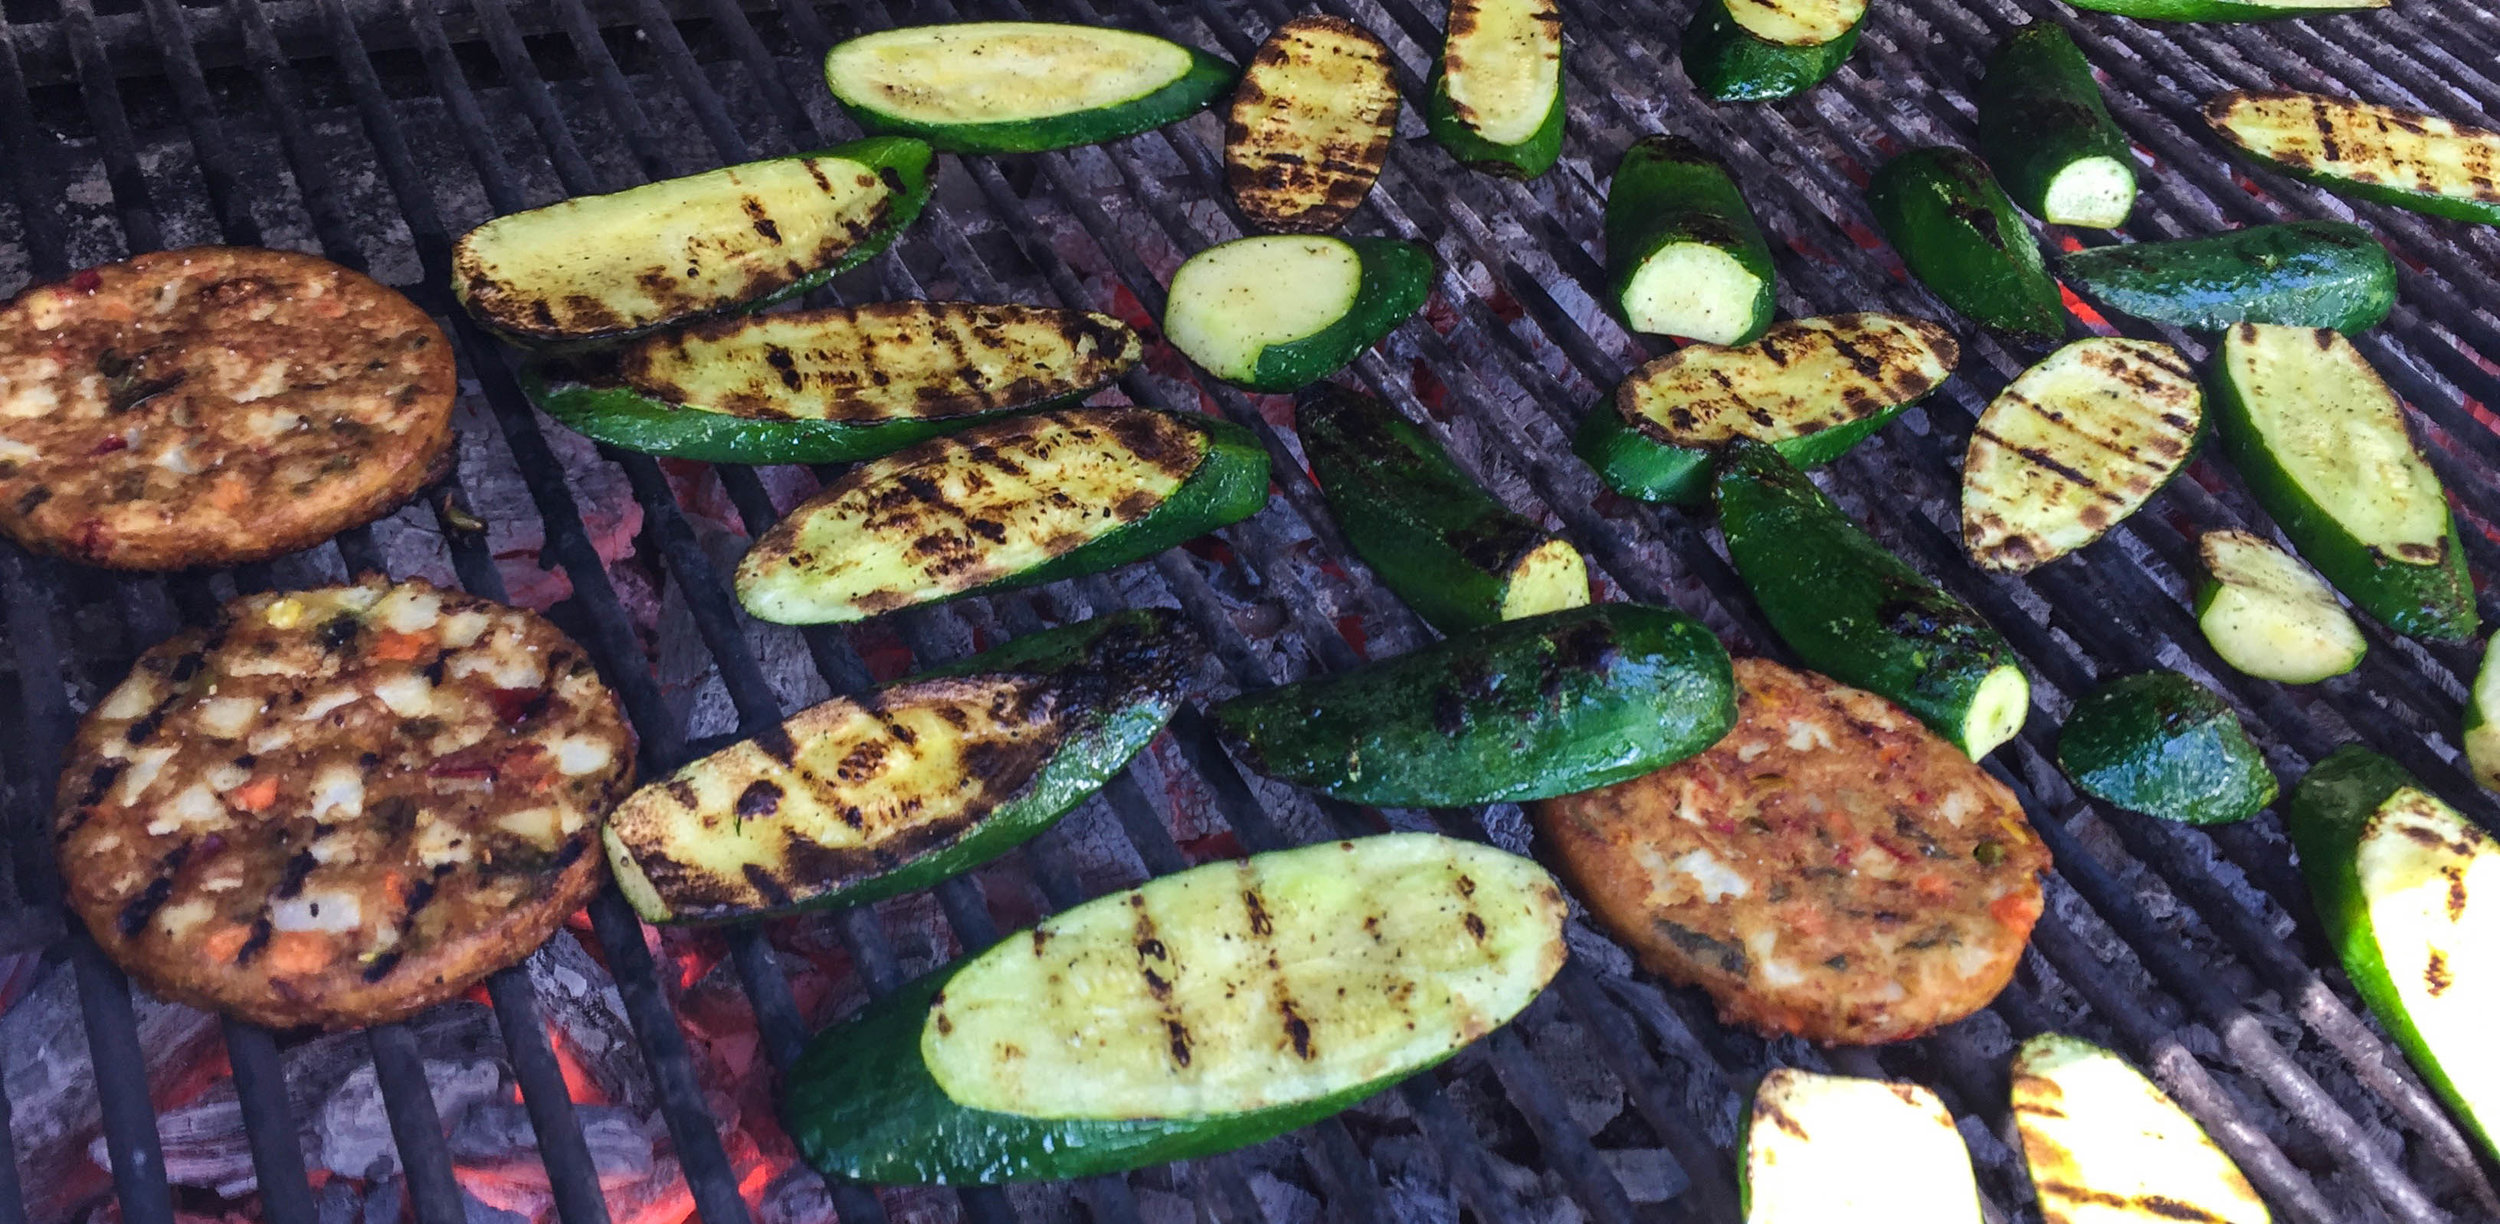 Vegetarian Grill